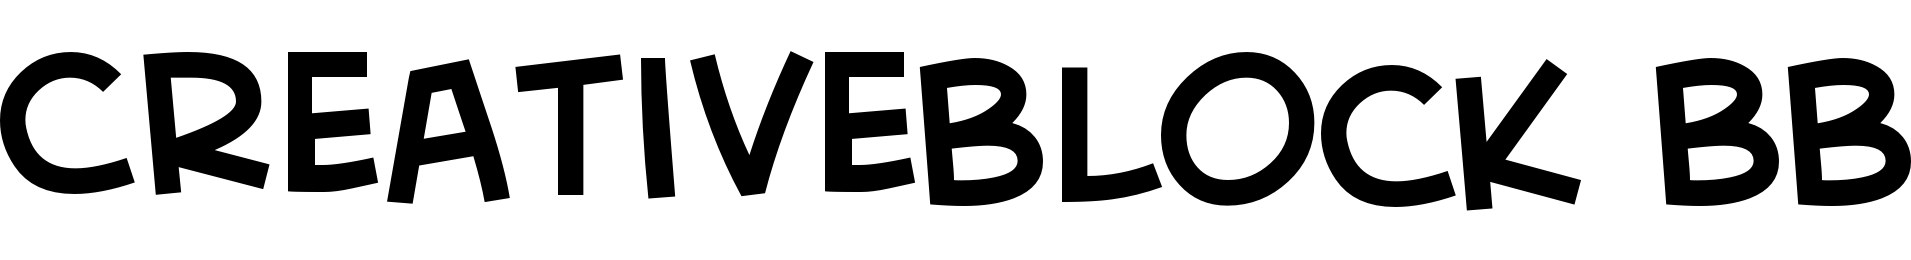 CreativeBlock BB